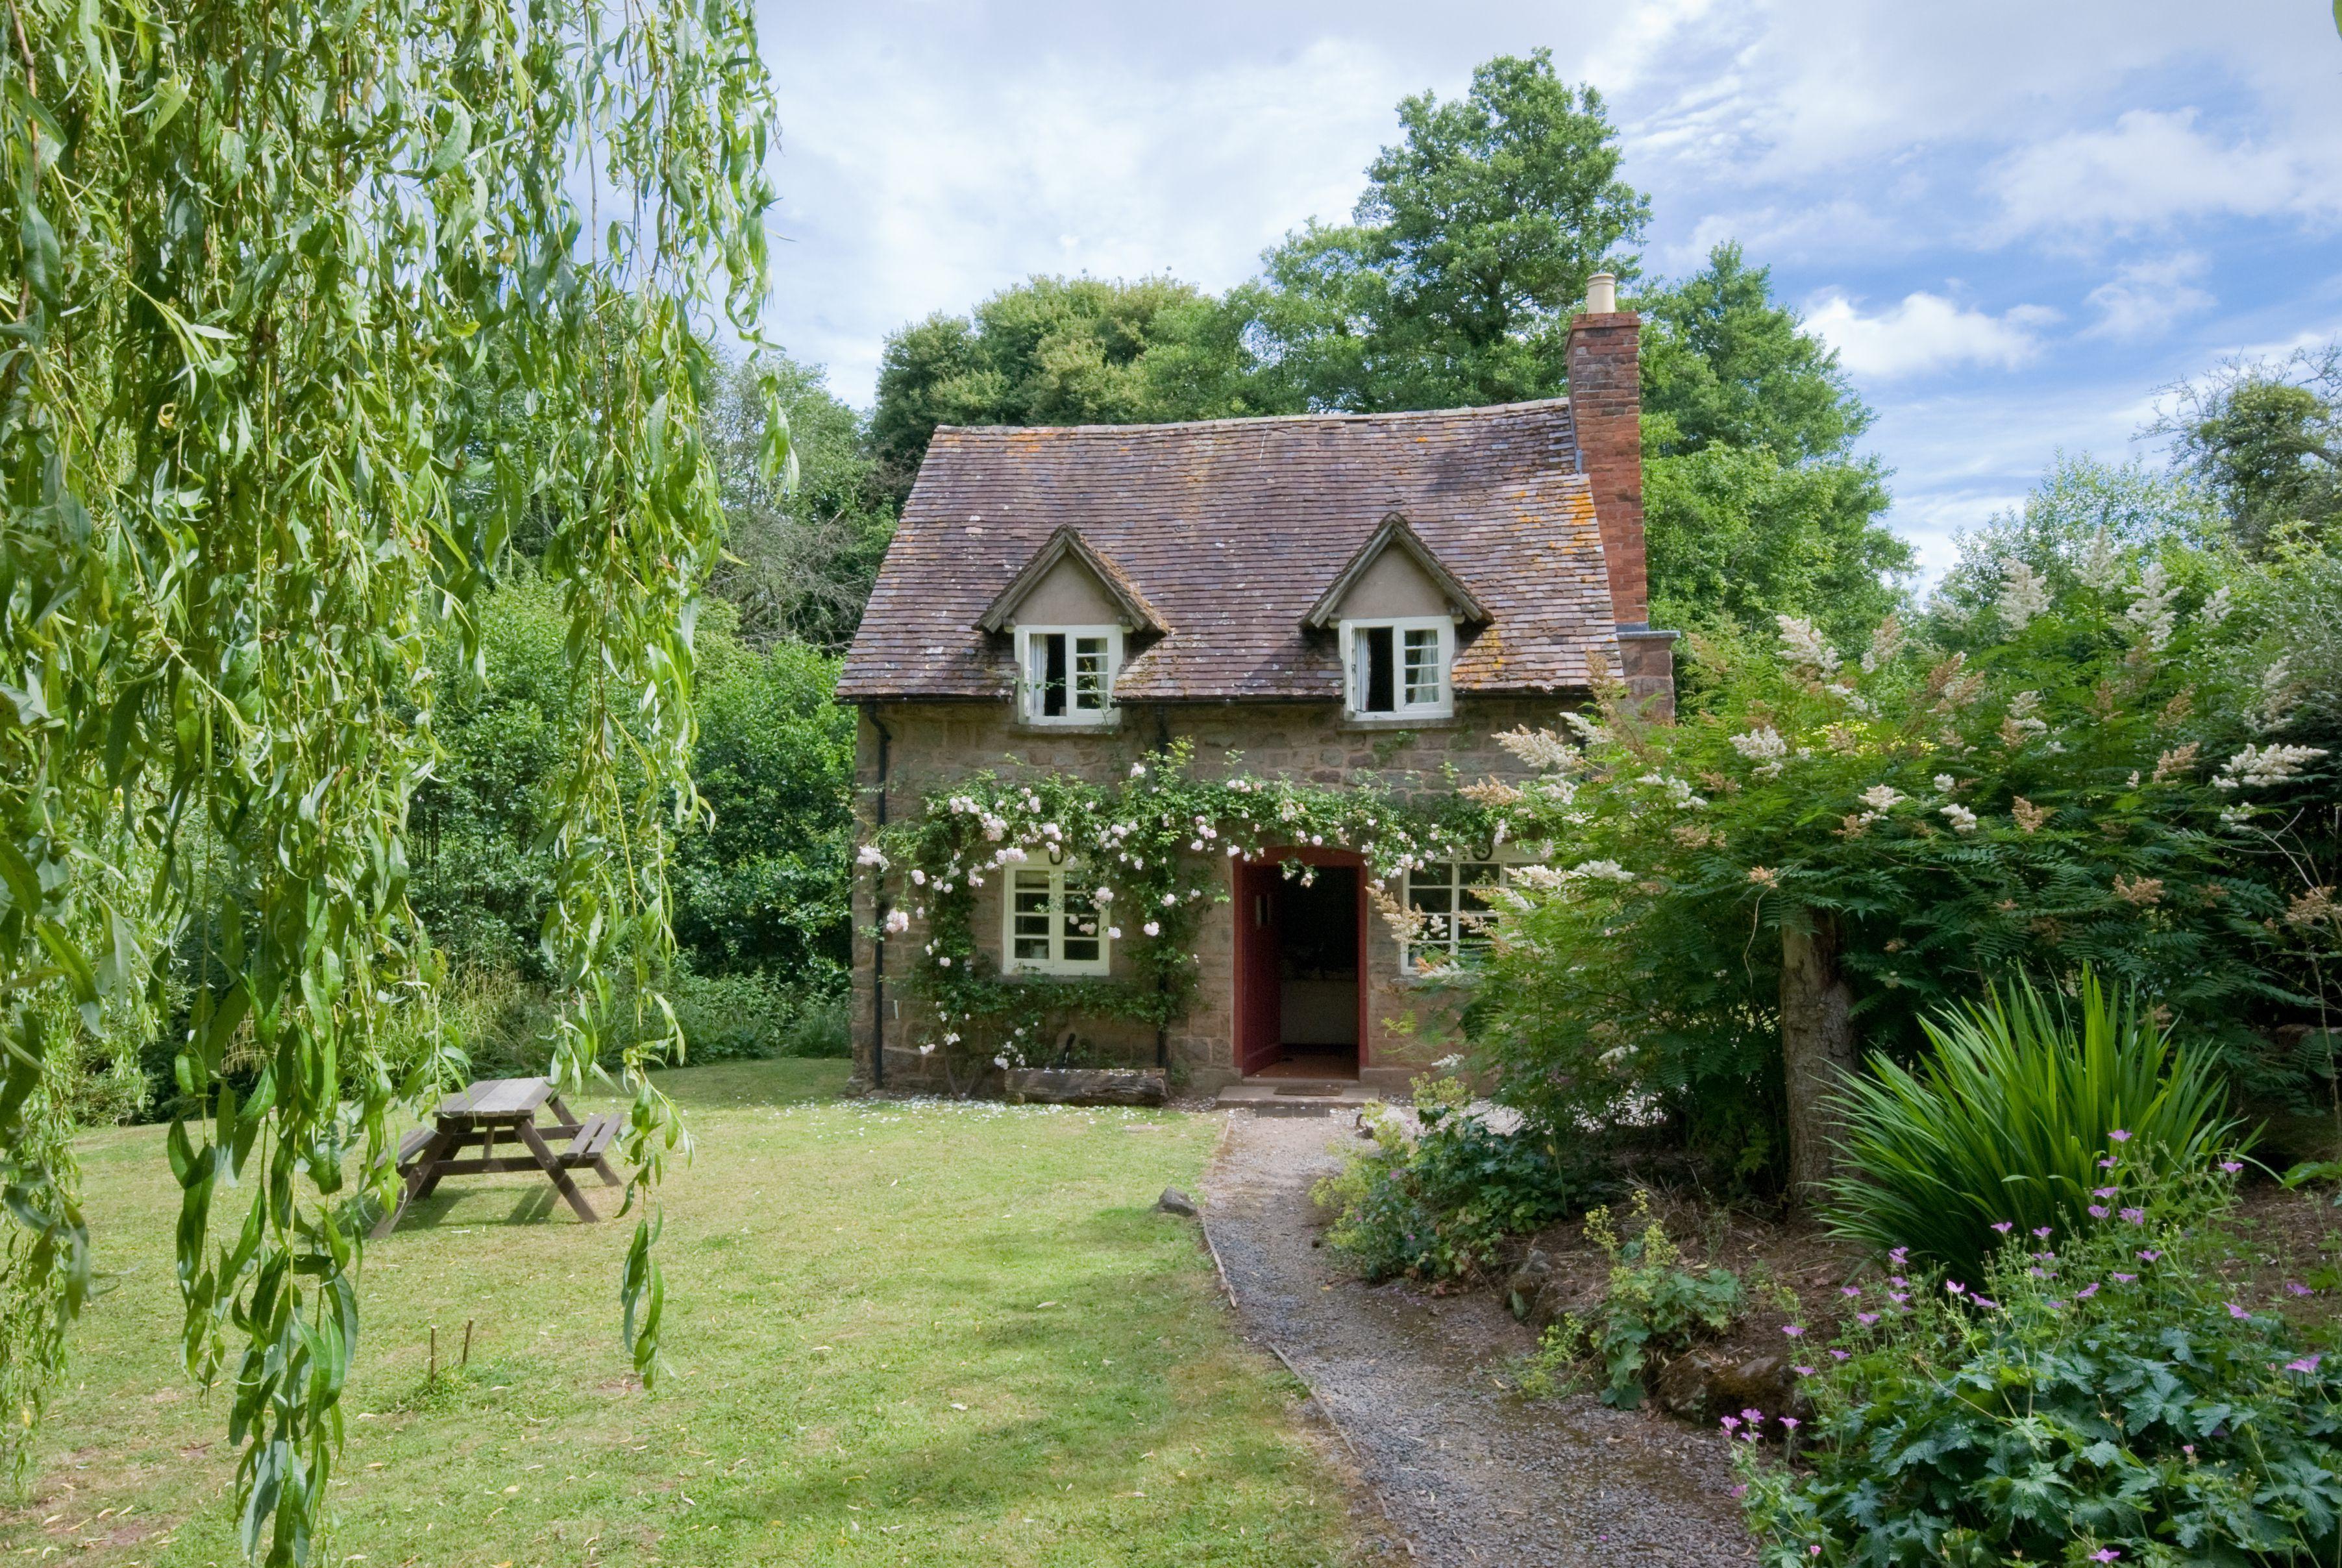 English Cottage Google Search English Cottage Decor English Cottage Interiors Cottage Exterior